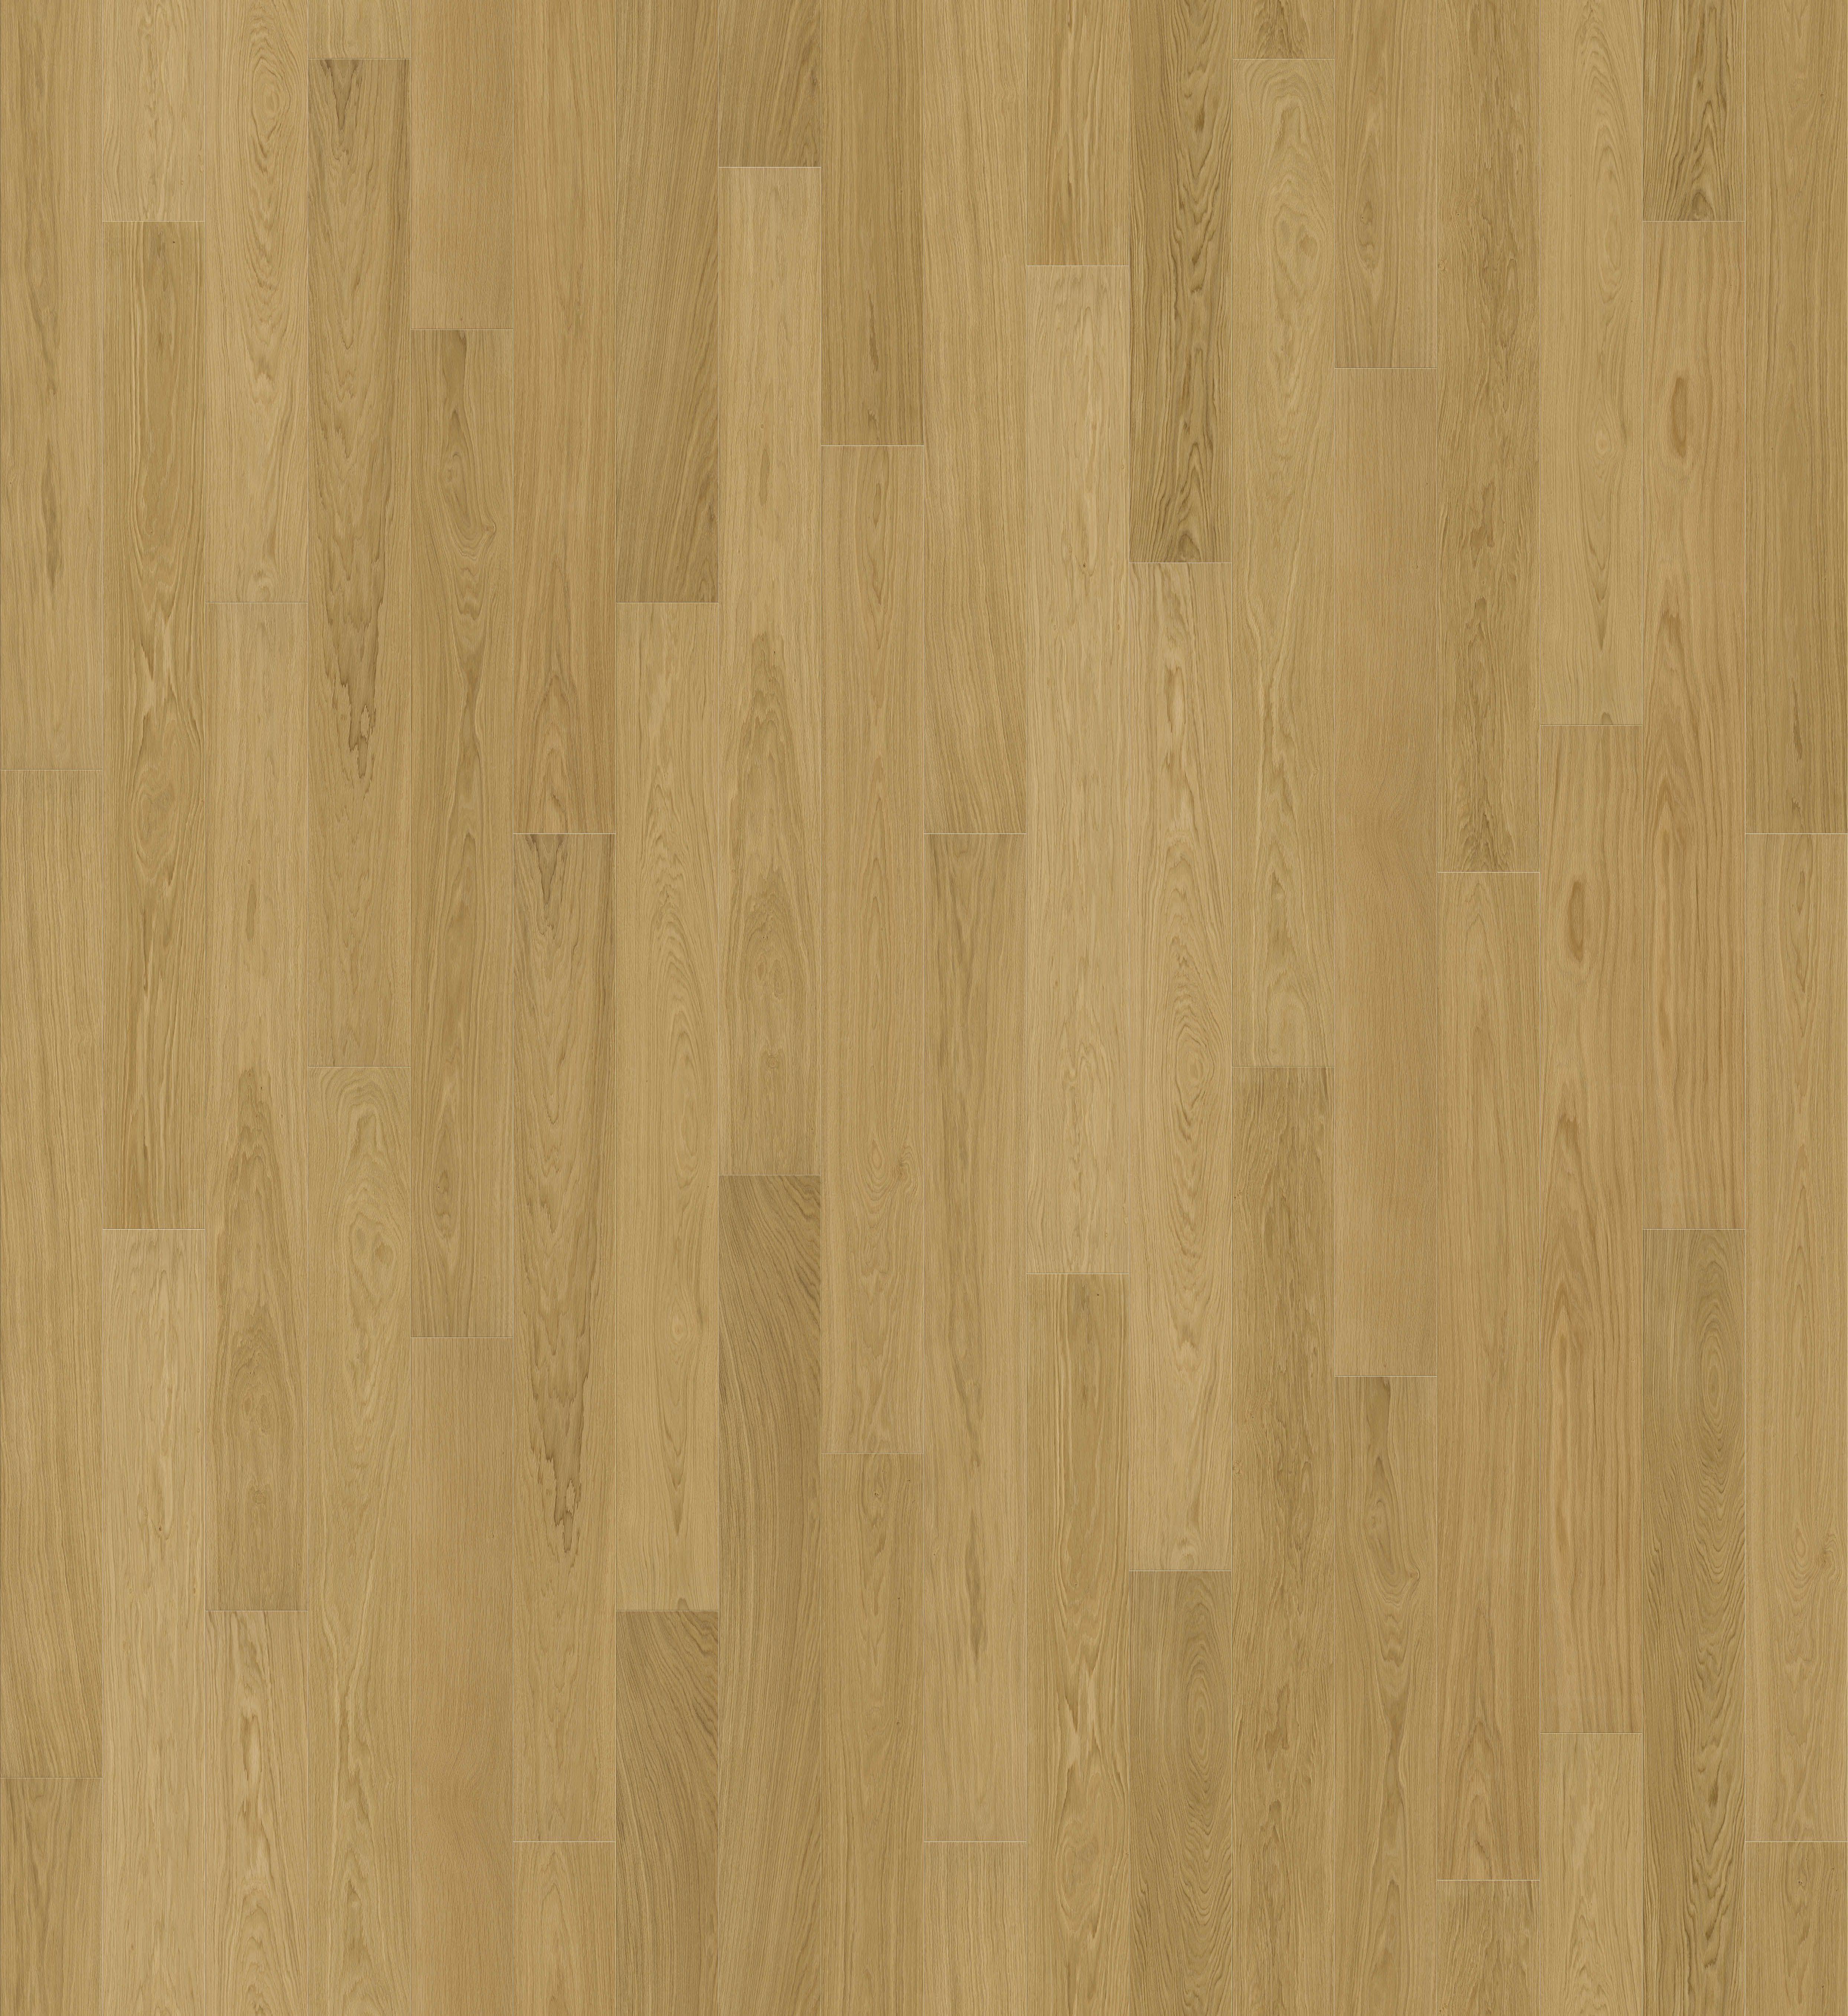 texture wood rich floor patterns wooden seamless planks background